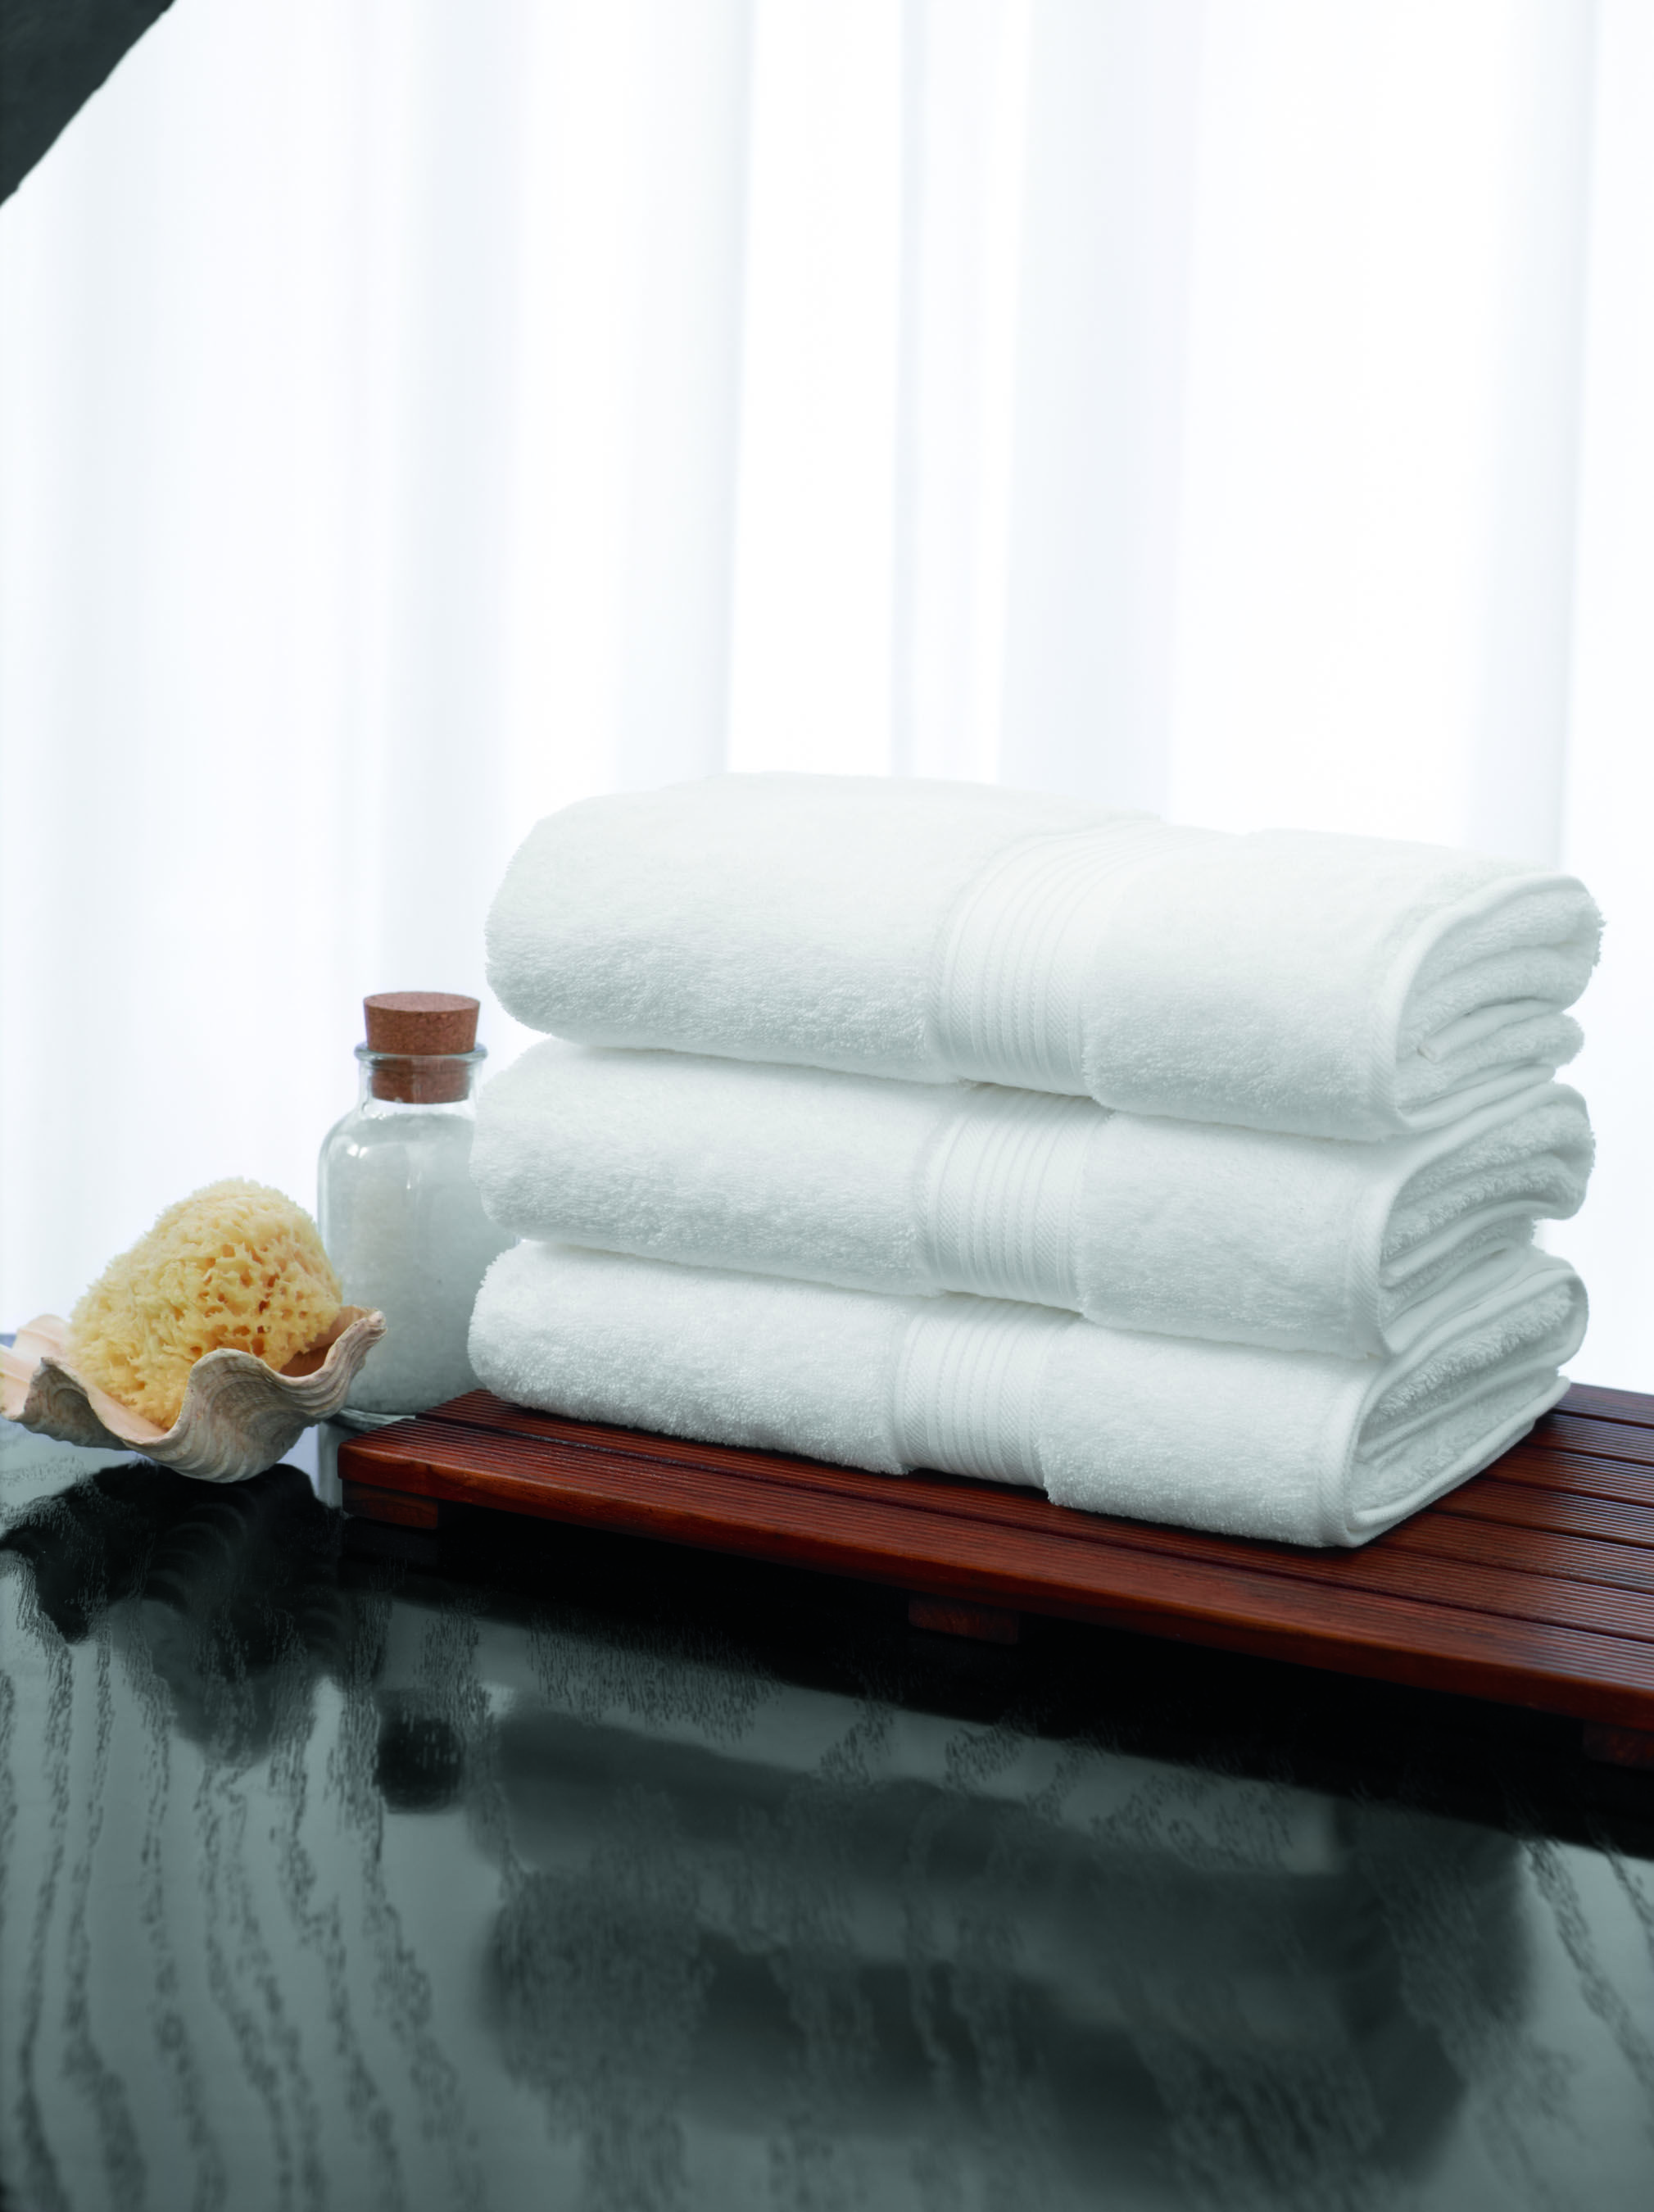 Spa Like Turkish Bath Towels Sooo Soft Bed Bath And Beyond